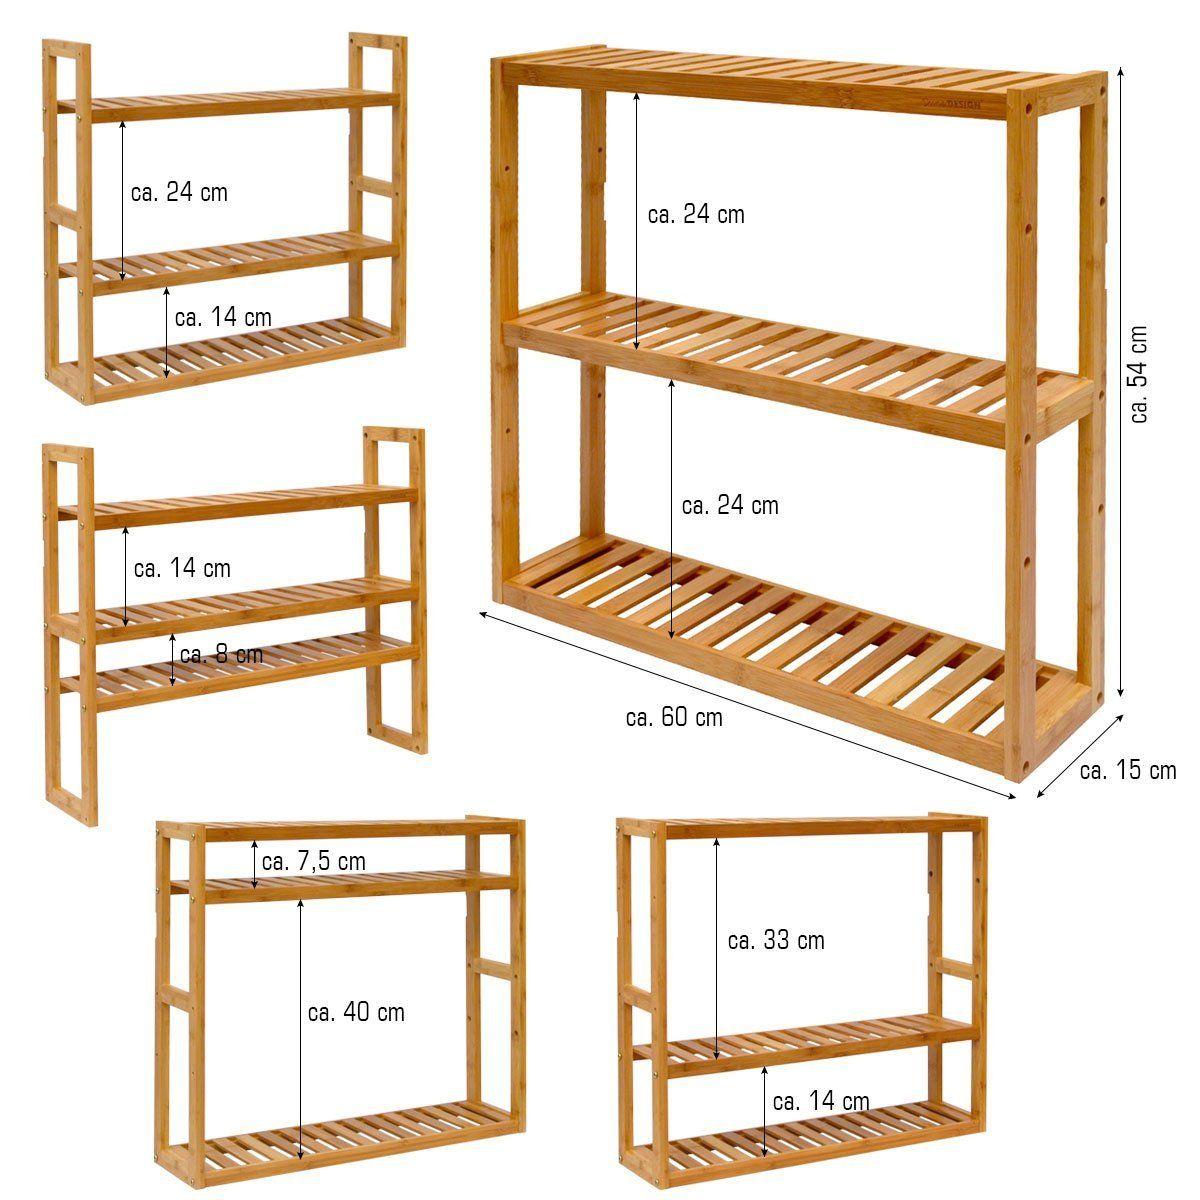 Full Size of Küche Hängeregal Dunedesign Wandregal 54x60x15cm Bambus Bad Regal 3 Fcher Holz Erweitern Holzbrett Wasserhahn Wandanschluss Billige Pendeltür Wohnzimmer Küche Hängeregal